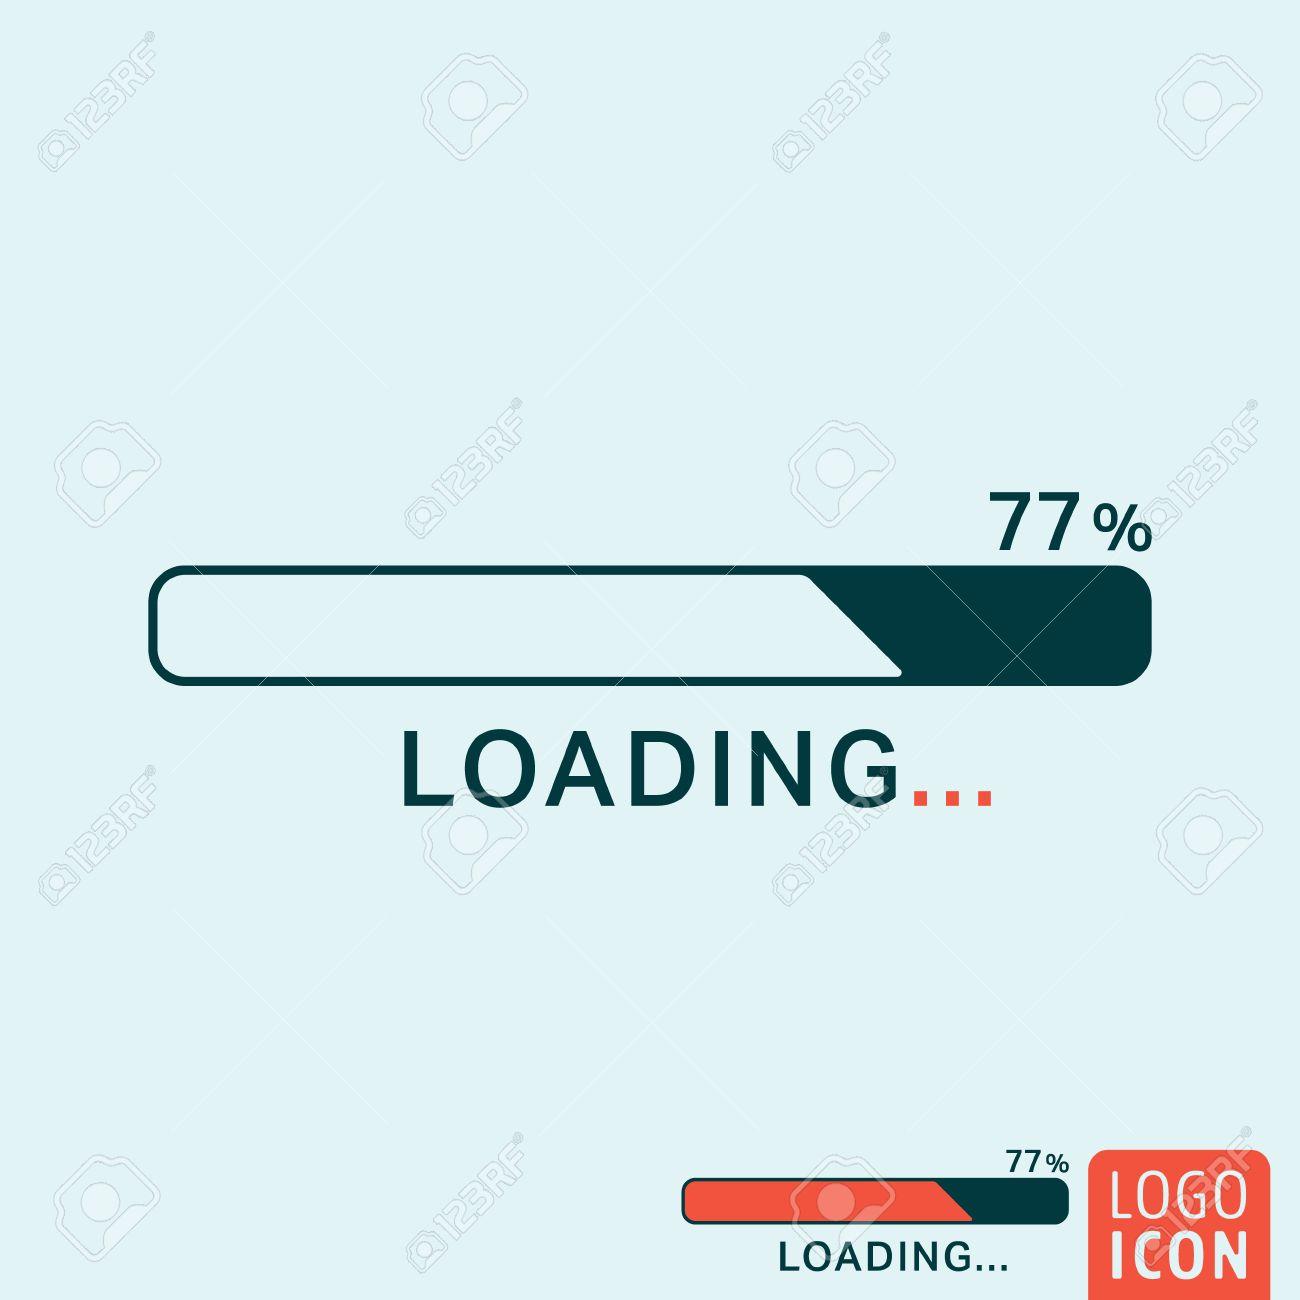 Loading icon loading logo loading symbol progress bar icon loading icon loading logo loading symbol progress bar icon isolated minimal design biocorpaavc Image collections